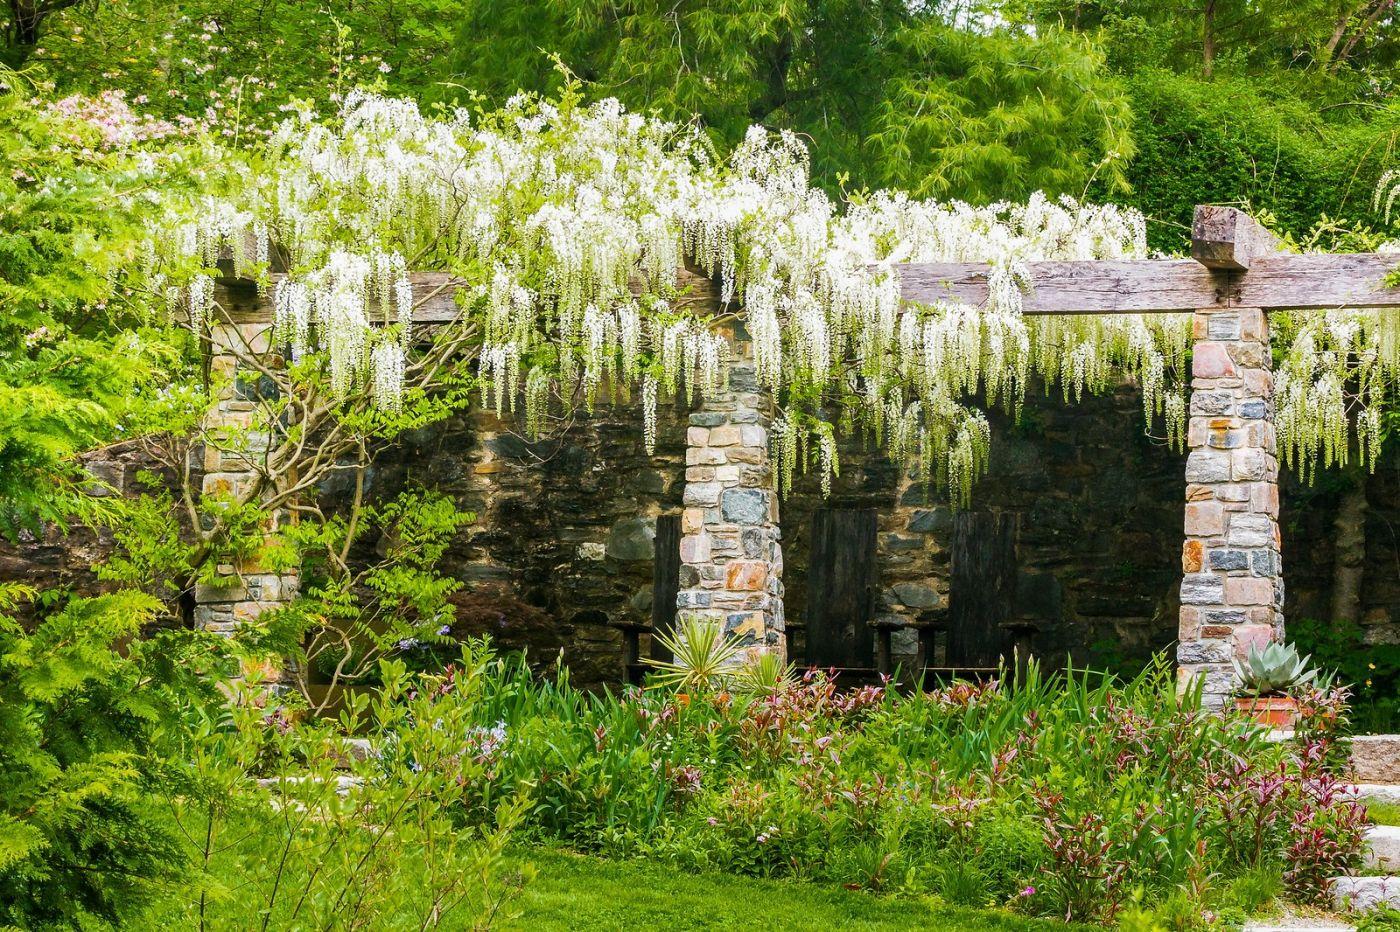 Chanticleer花园,那年盛开的紫藤花_图1-5